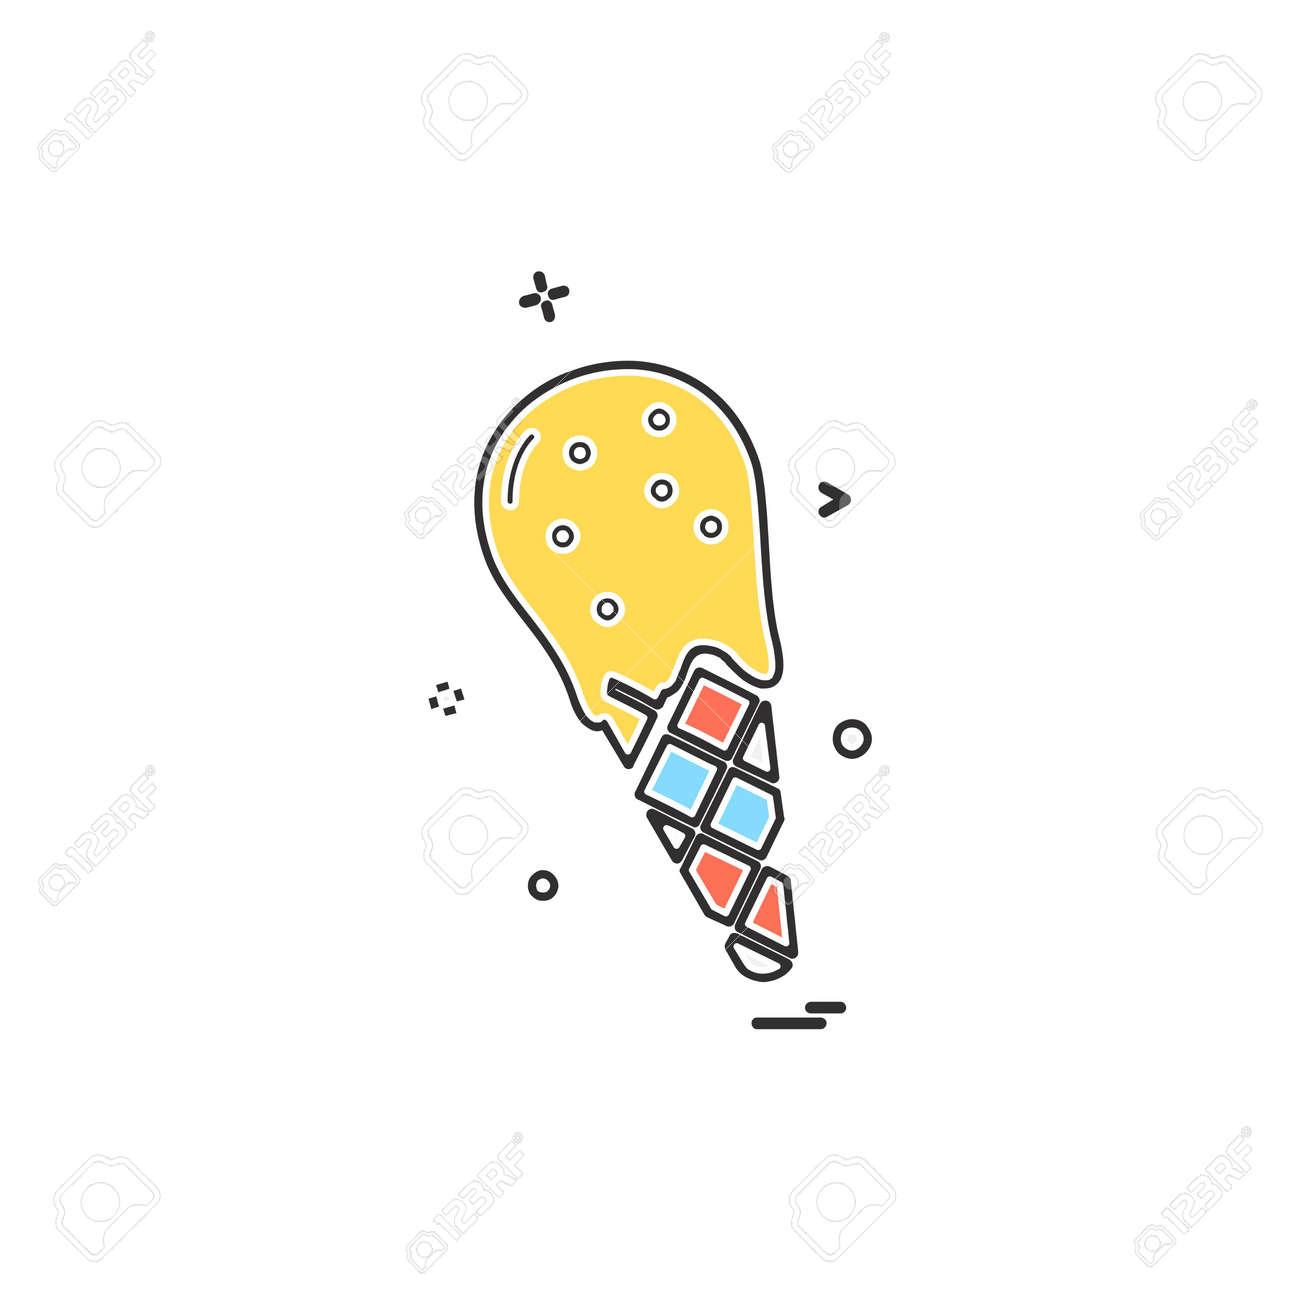 Icecream icon design vector - 118353436